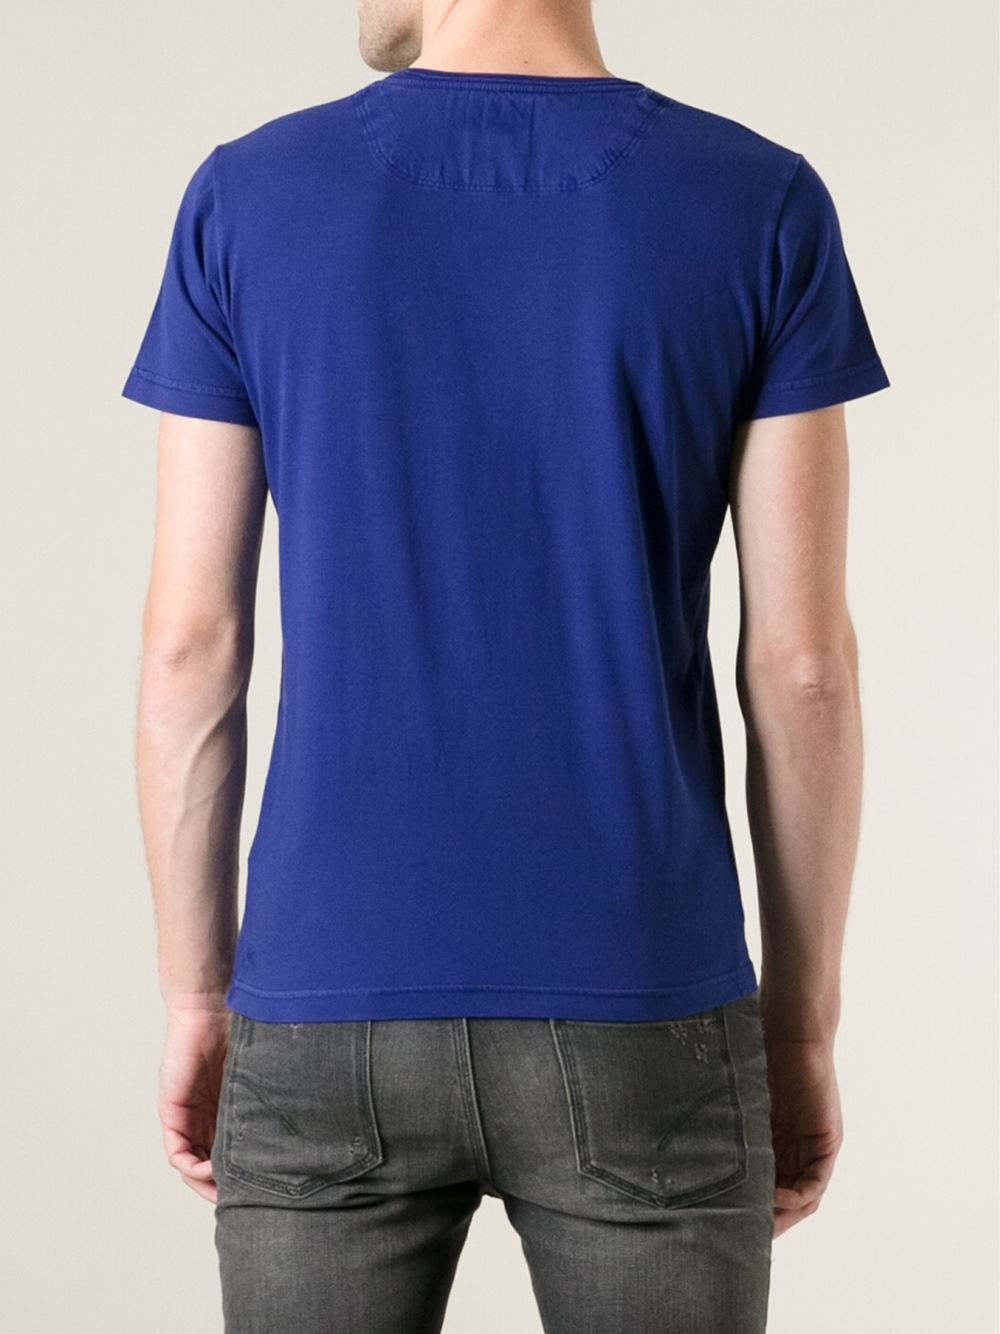 diesel 39 t achell 39 t shirt in blue for men lyst. Black Bedroom Furniture Sets. Home Design Ideas